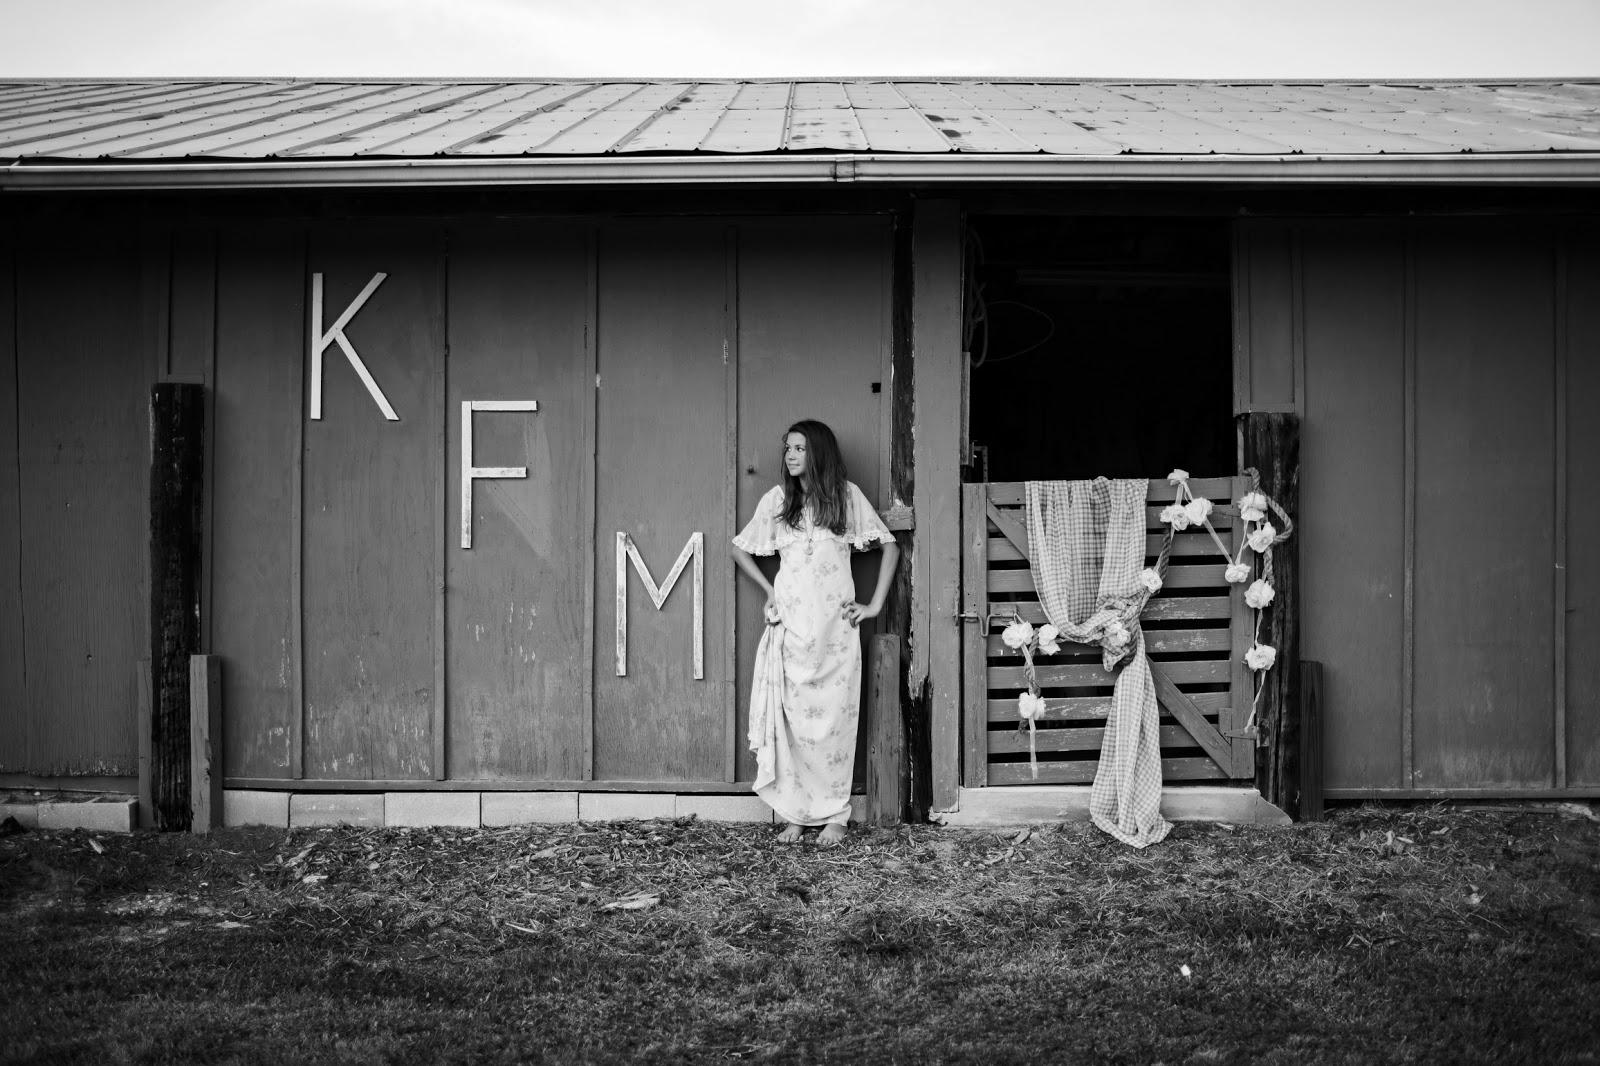 Family farm event loft wedding